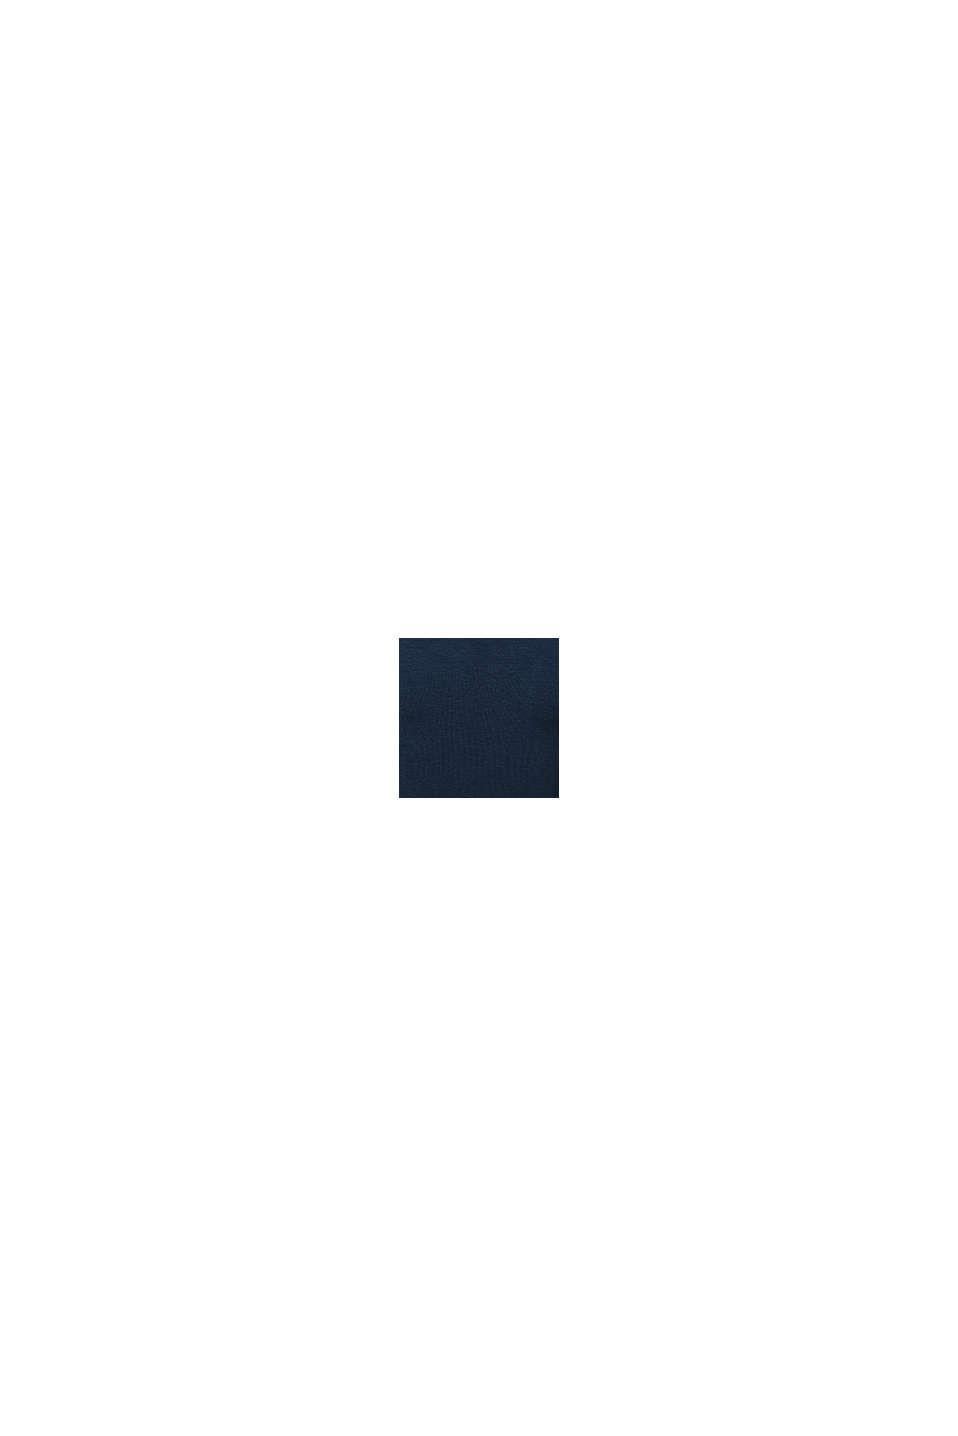 Top mit Stillfunktion, LENZING™ ECOVERO, NIGHT BLUE, swatch